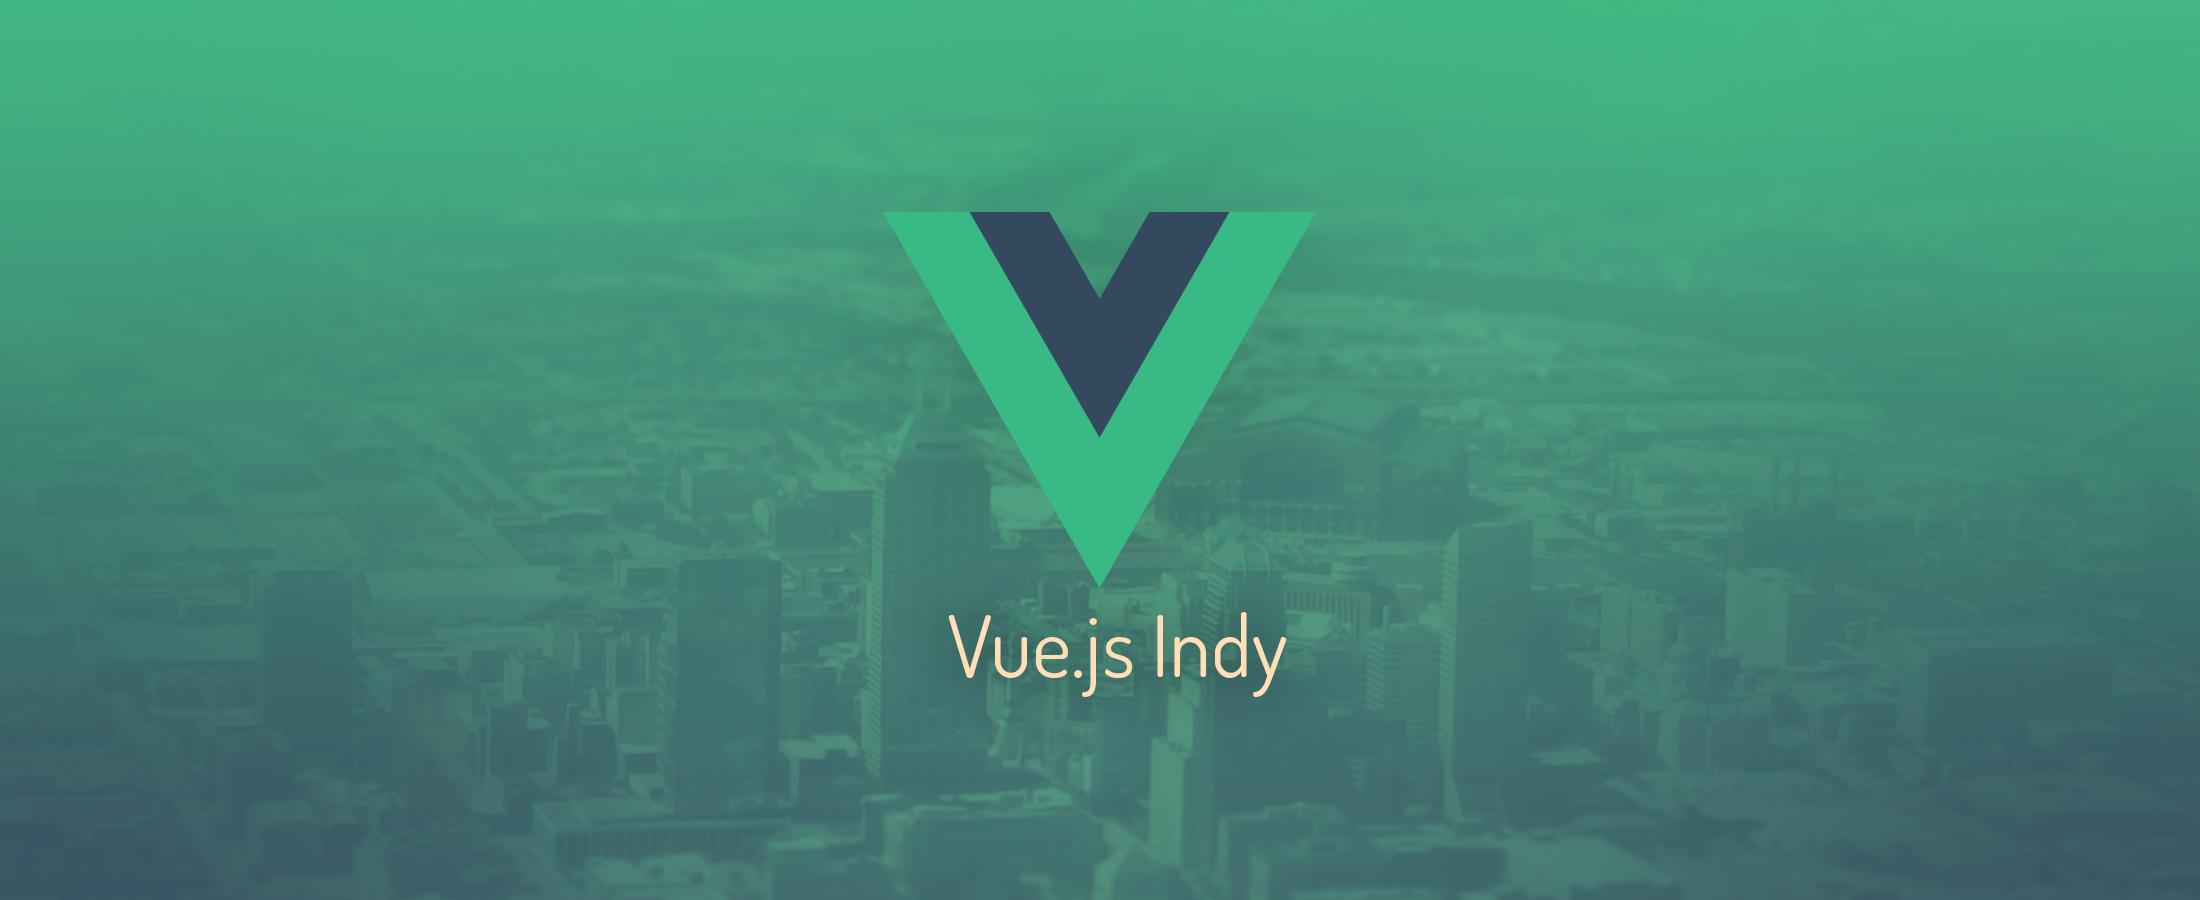 Vue.js Indy